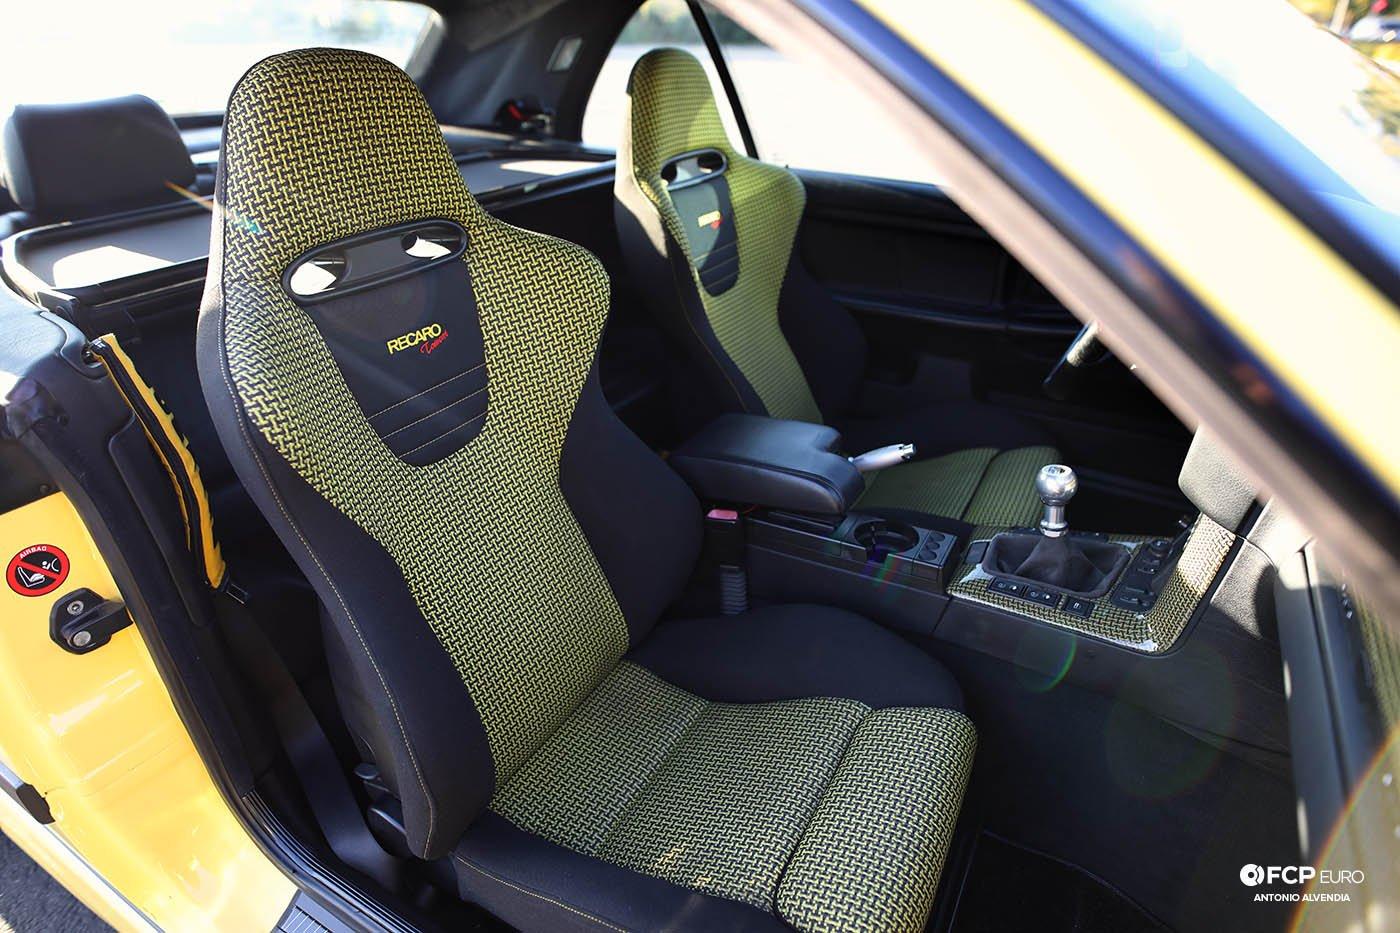 Recaro Tomcat seats E36 convertible M3